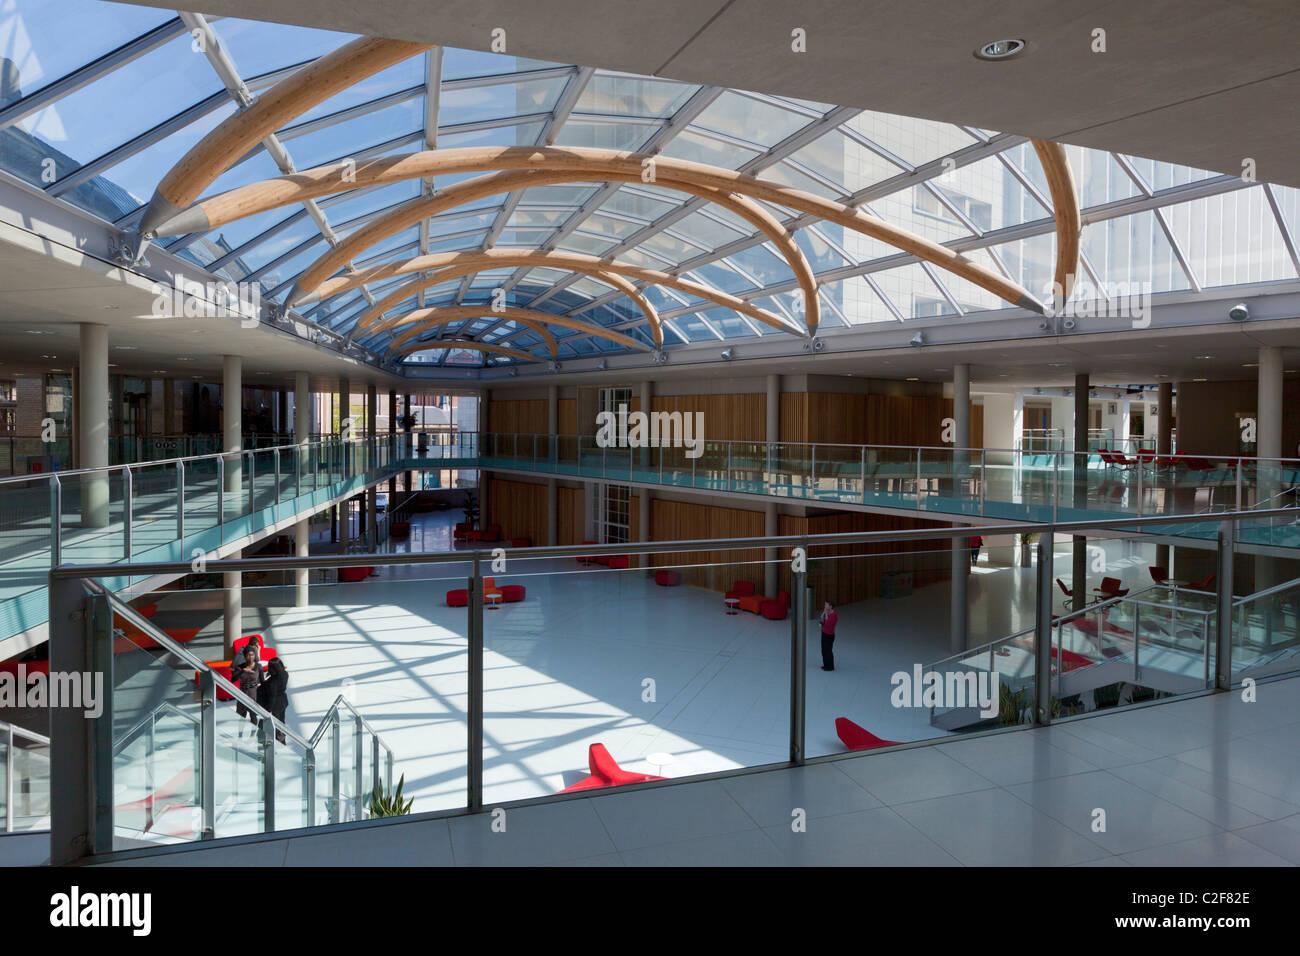 Newton and Arkwright Buildings Nottingham Trent University, Nottingham, United Kingdom - Stock Image